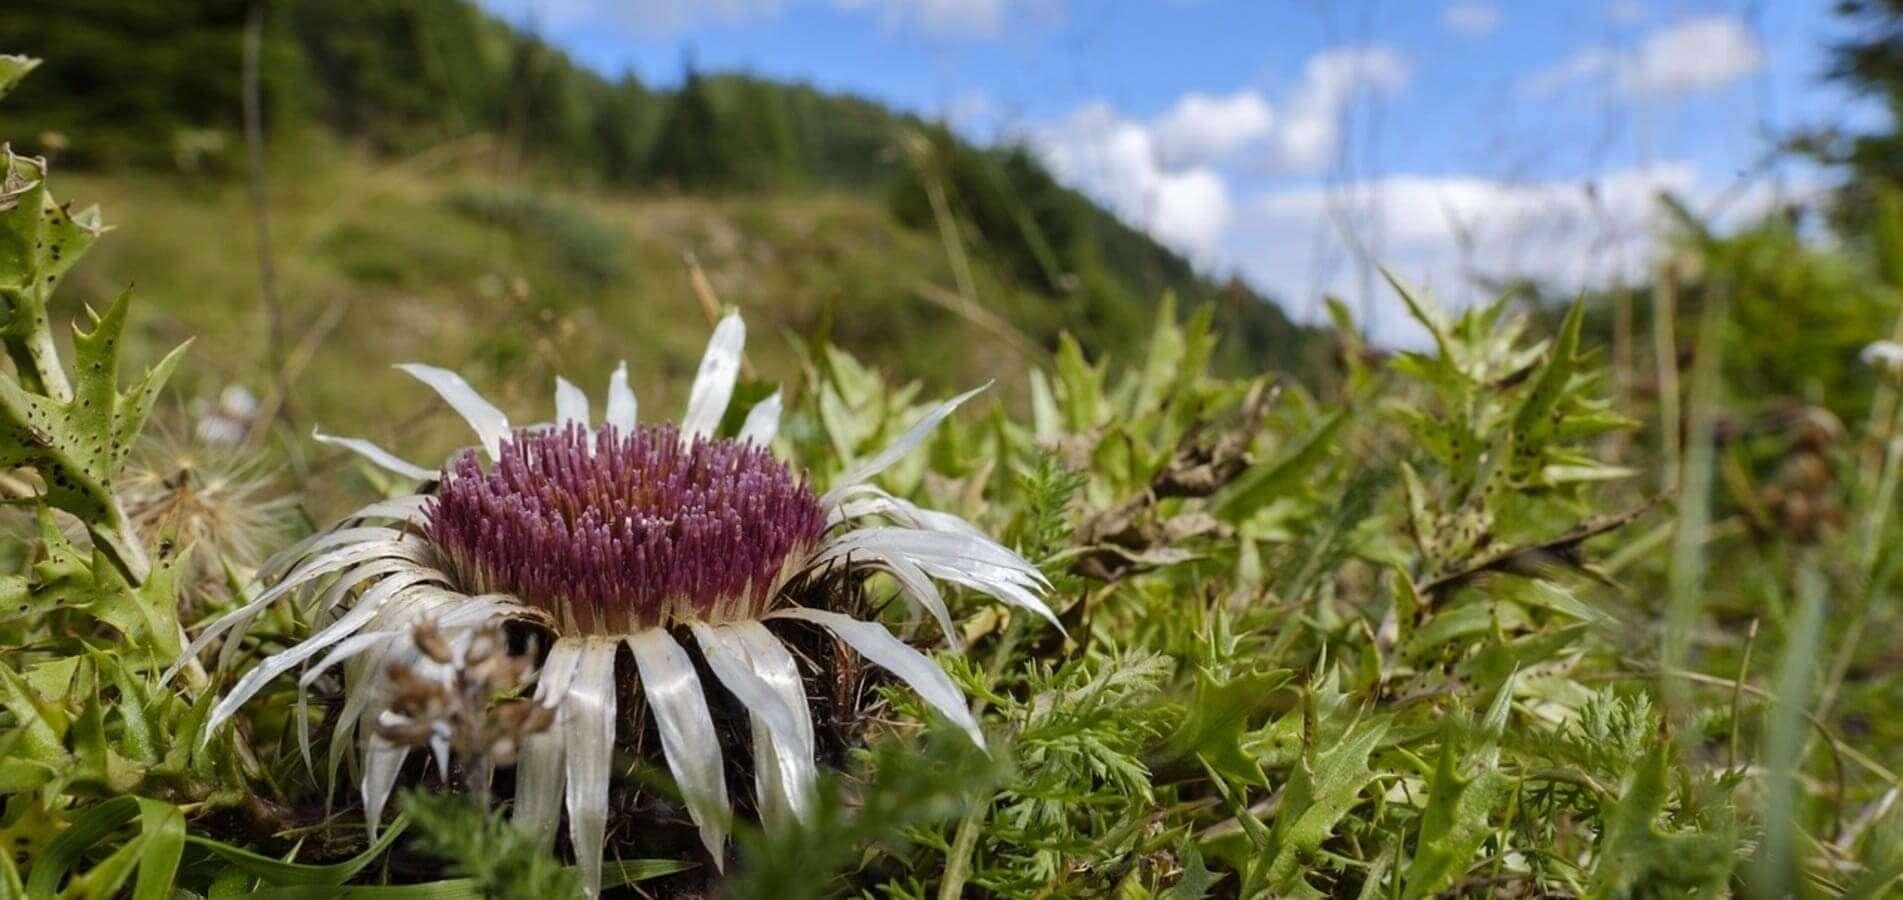 Eguzkilore, flor protectrora